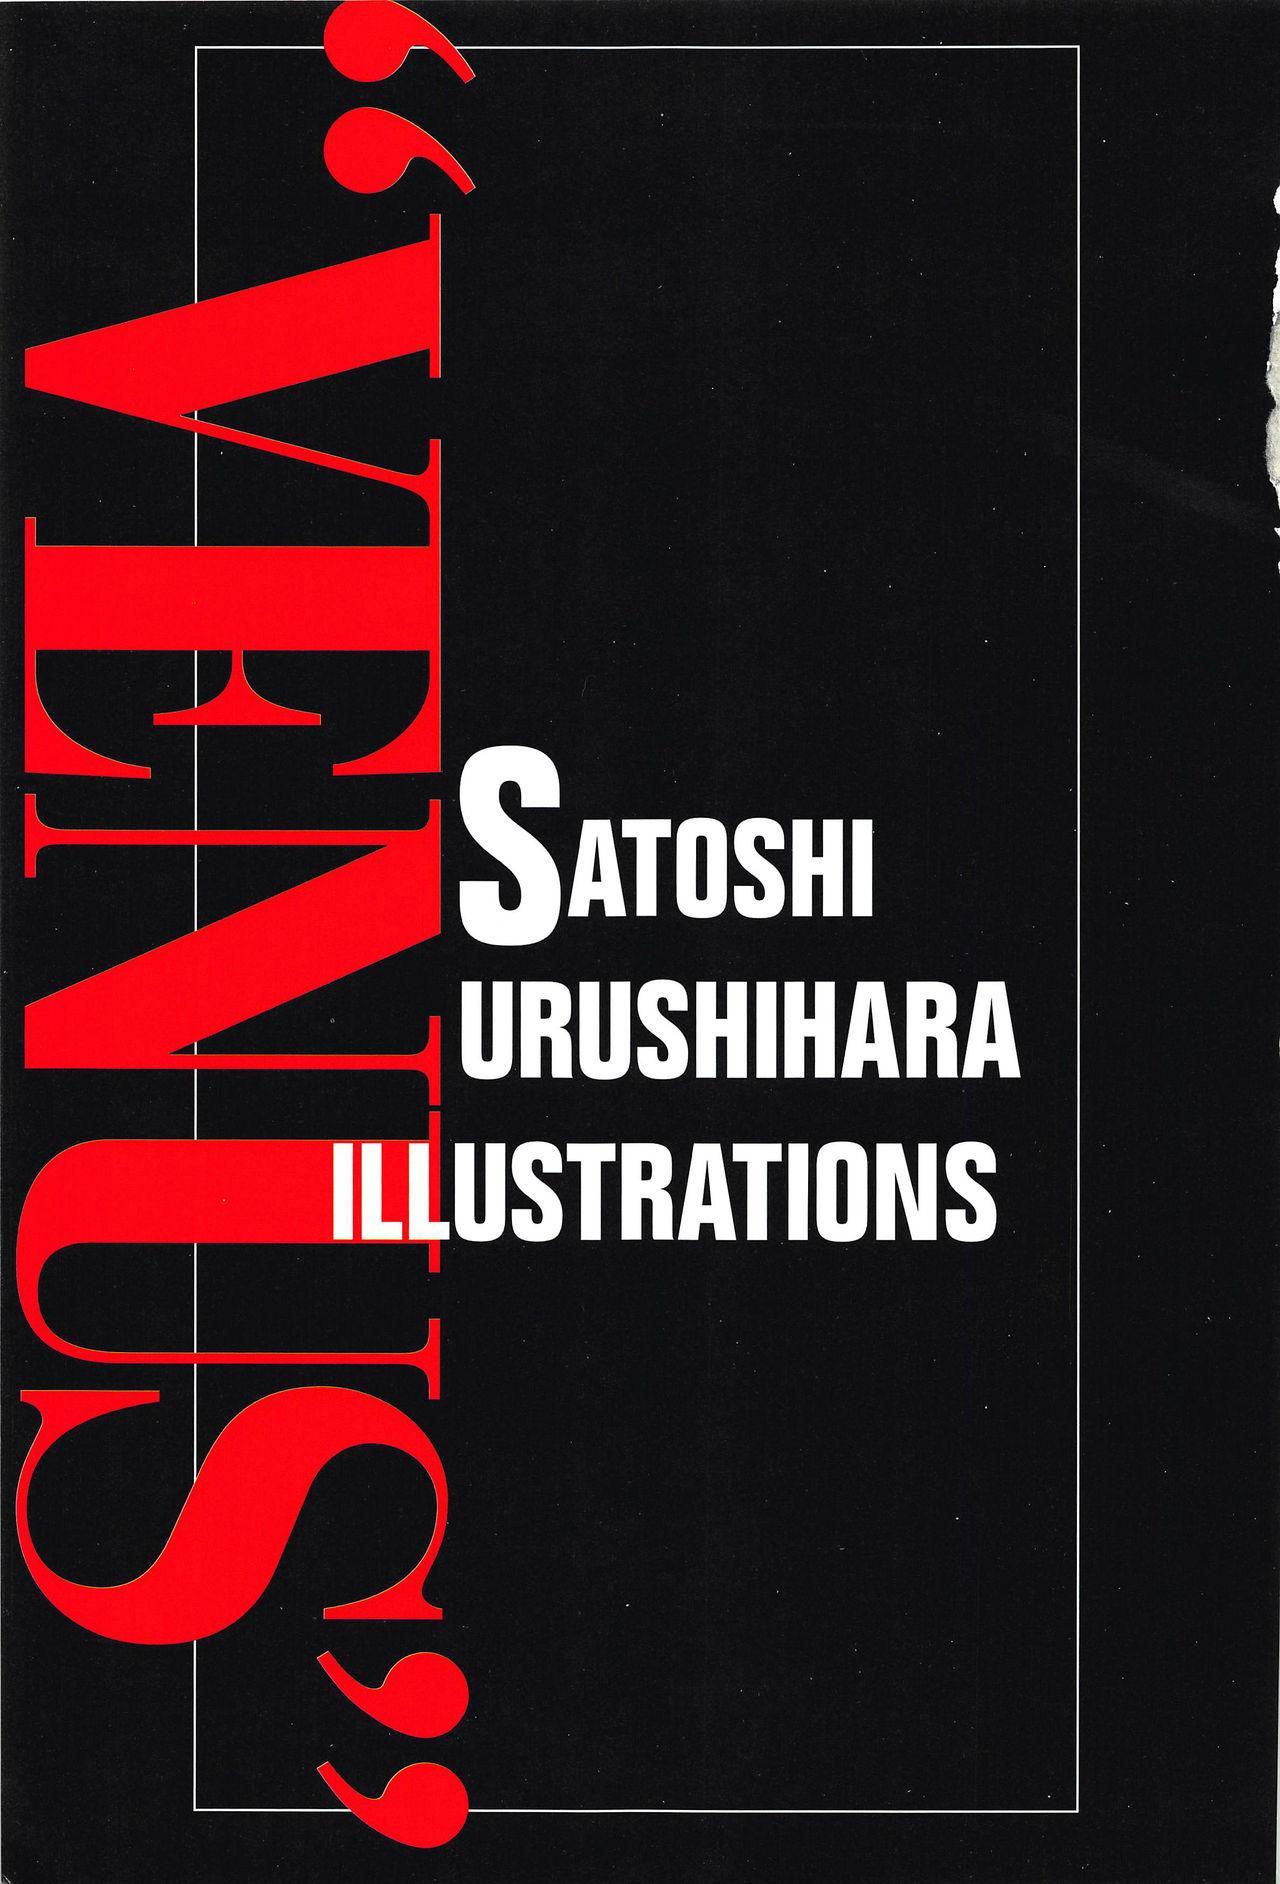 Venus Urushihara Satoshi Illustration Shuu 2